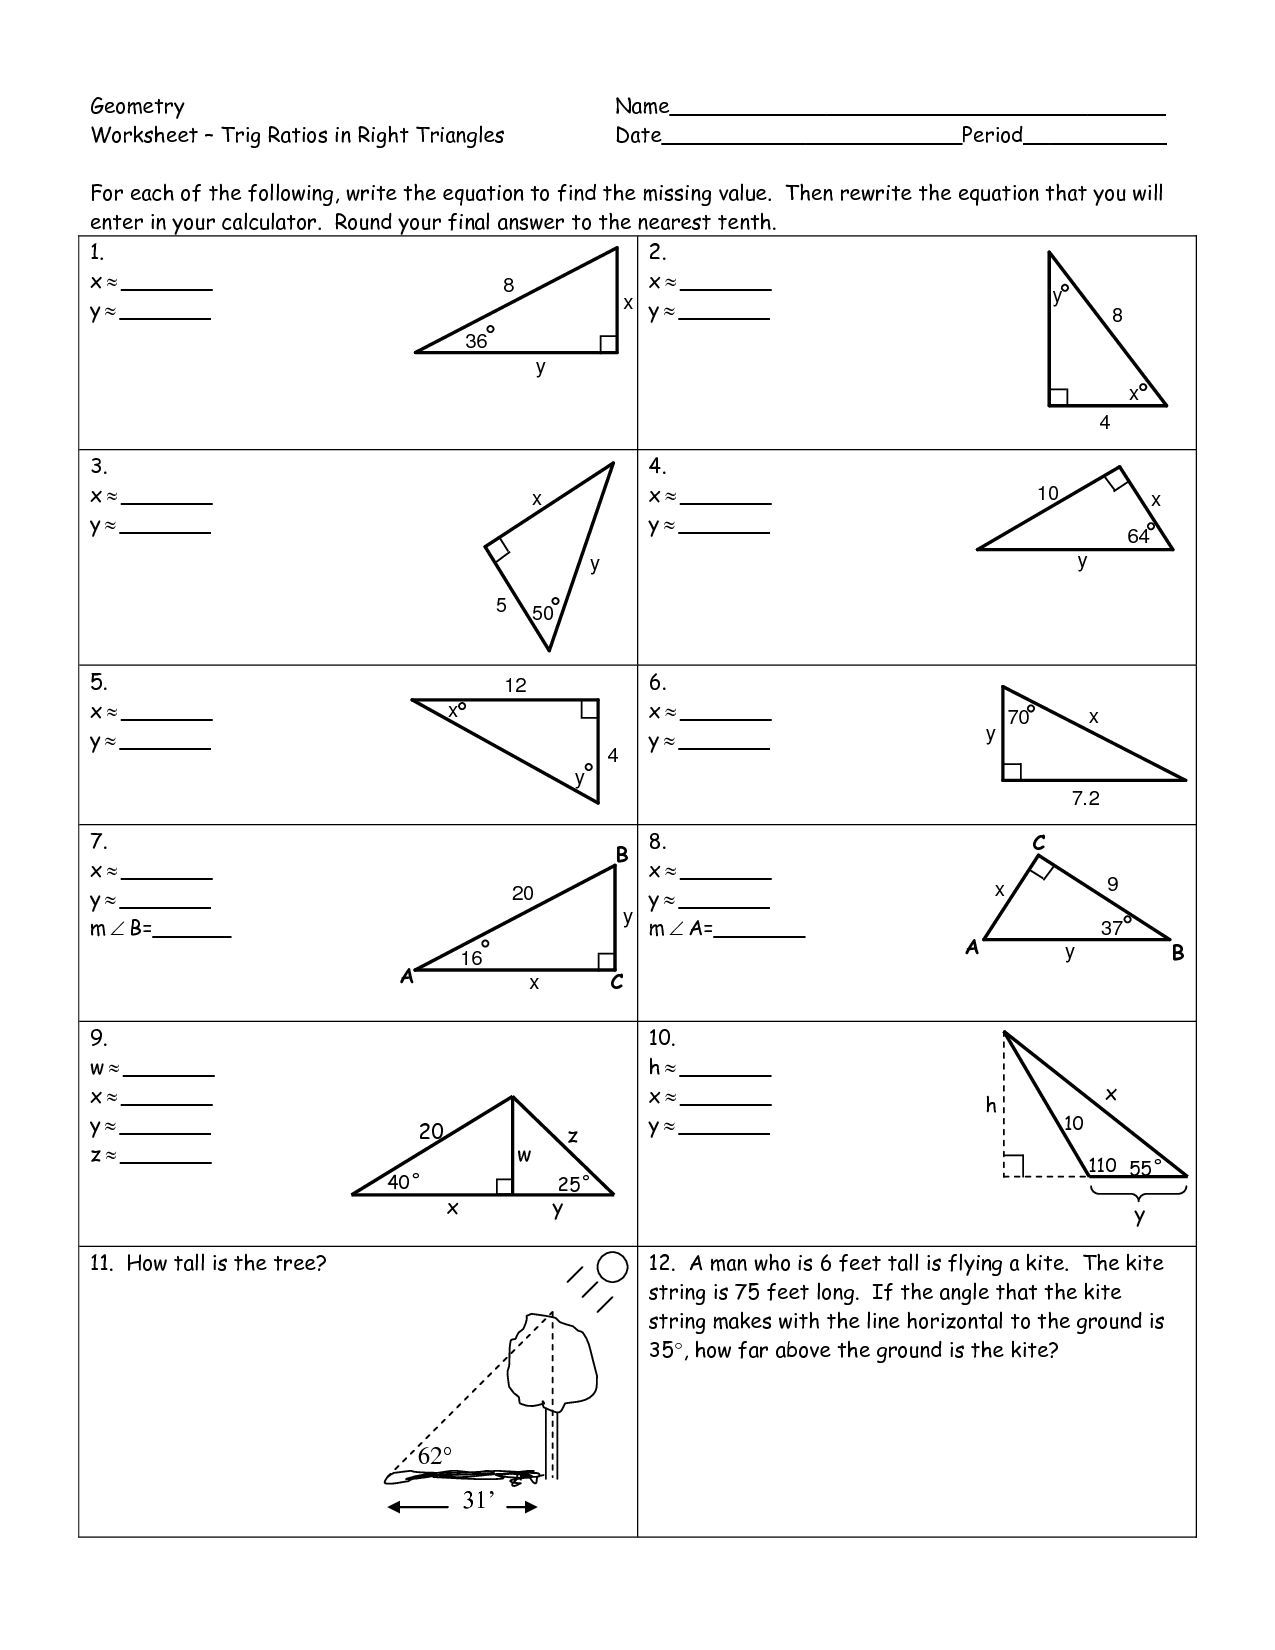 Trigonometry Worksheets Pdf A Trigonometry Worksheets Pdf Is